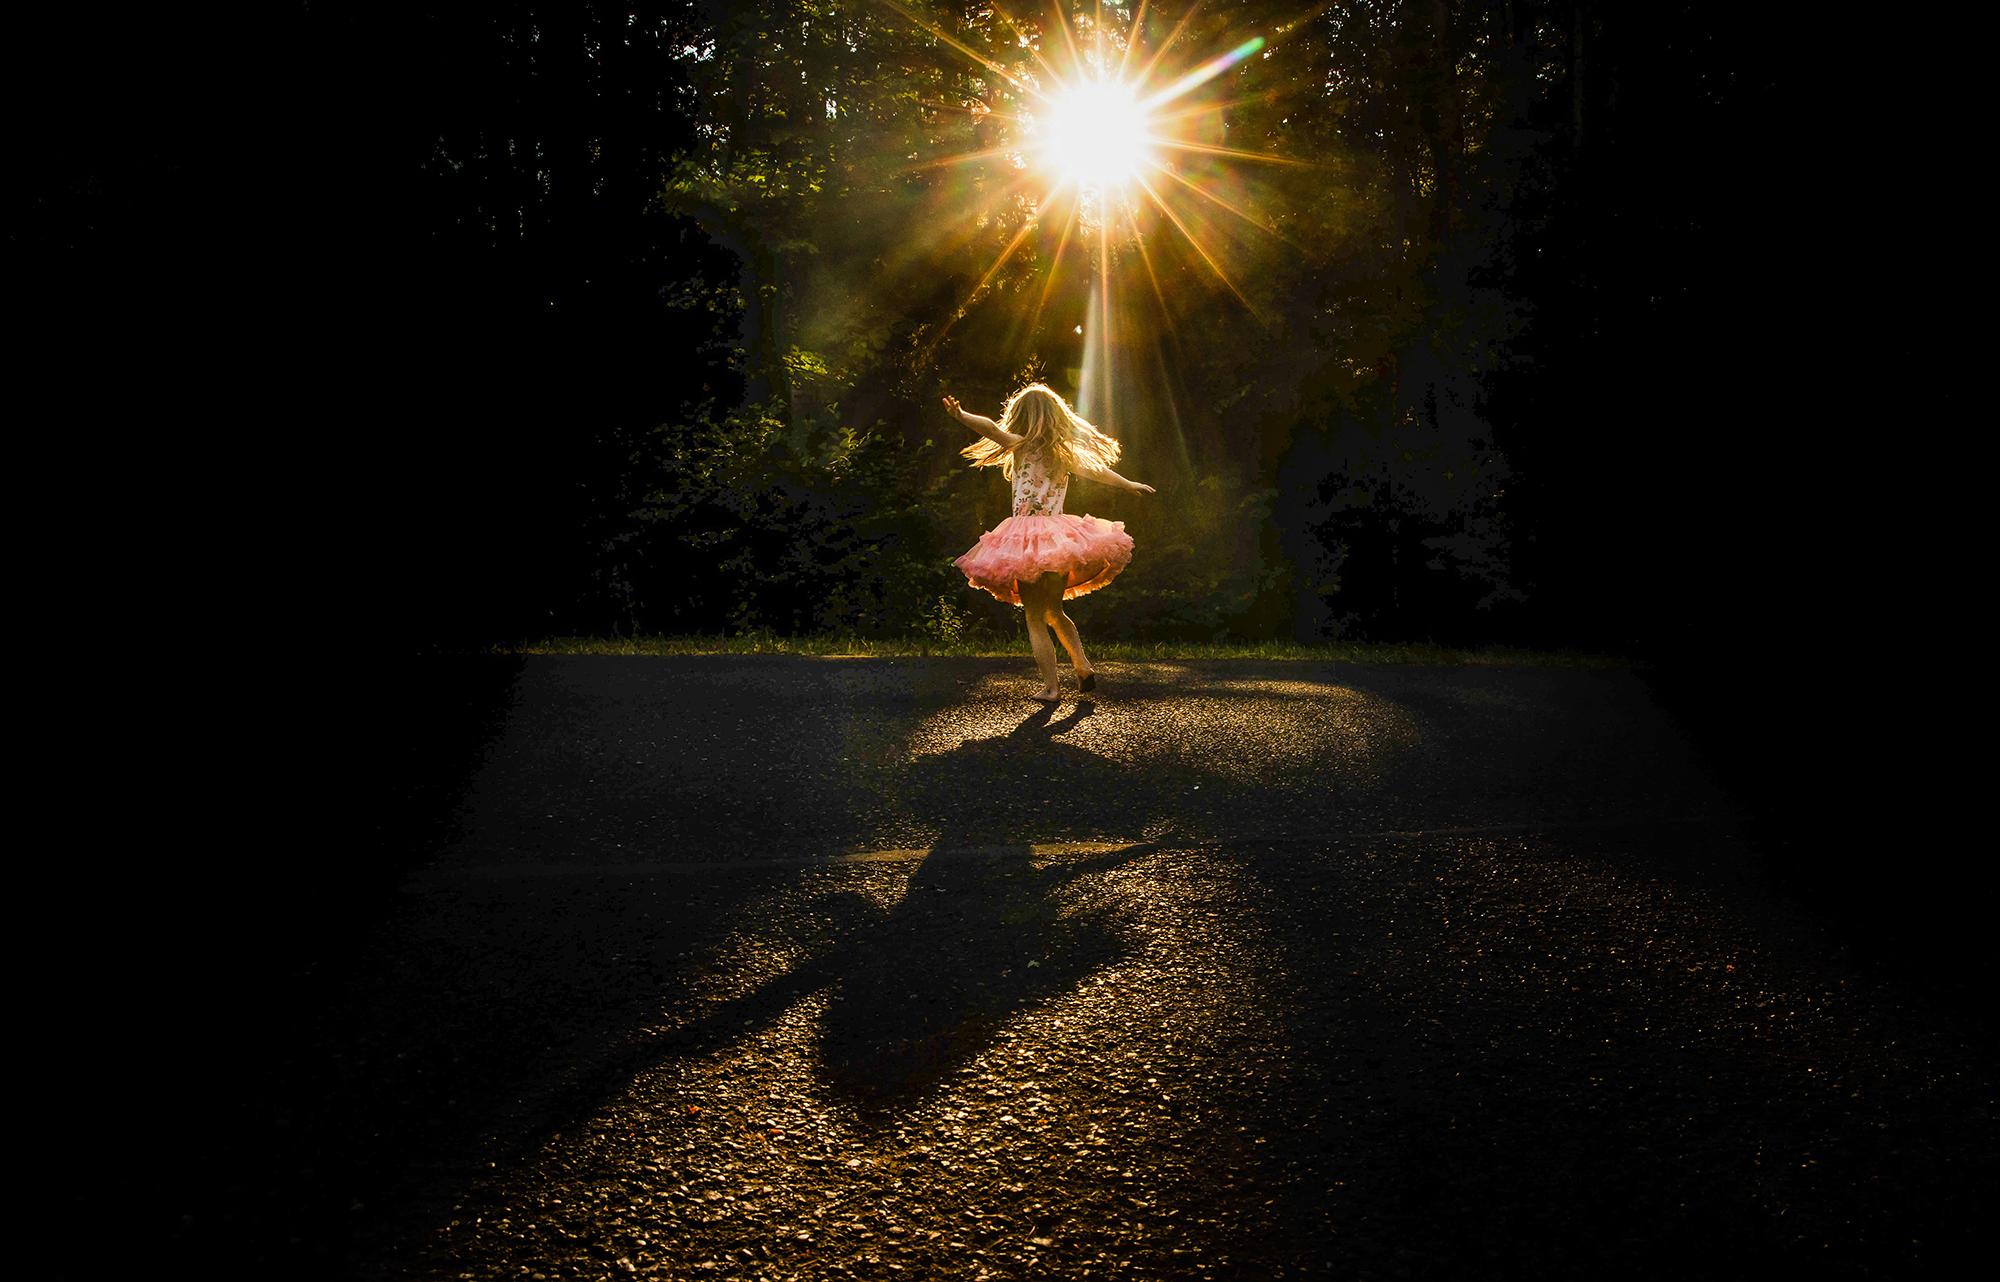 Dana-Leigh_The-Illuminated-Artist-Click-Photo-School0025